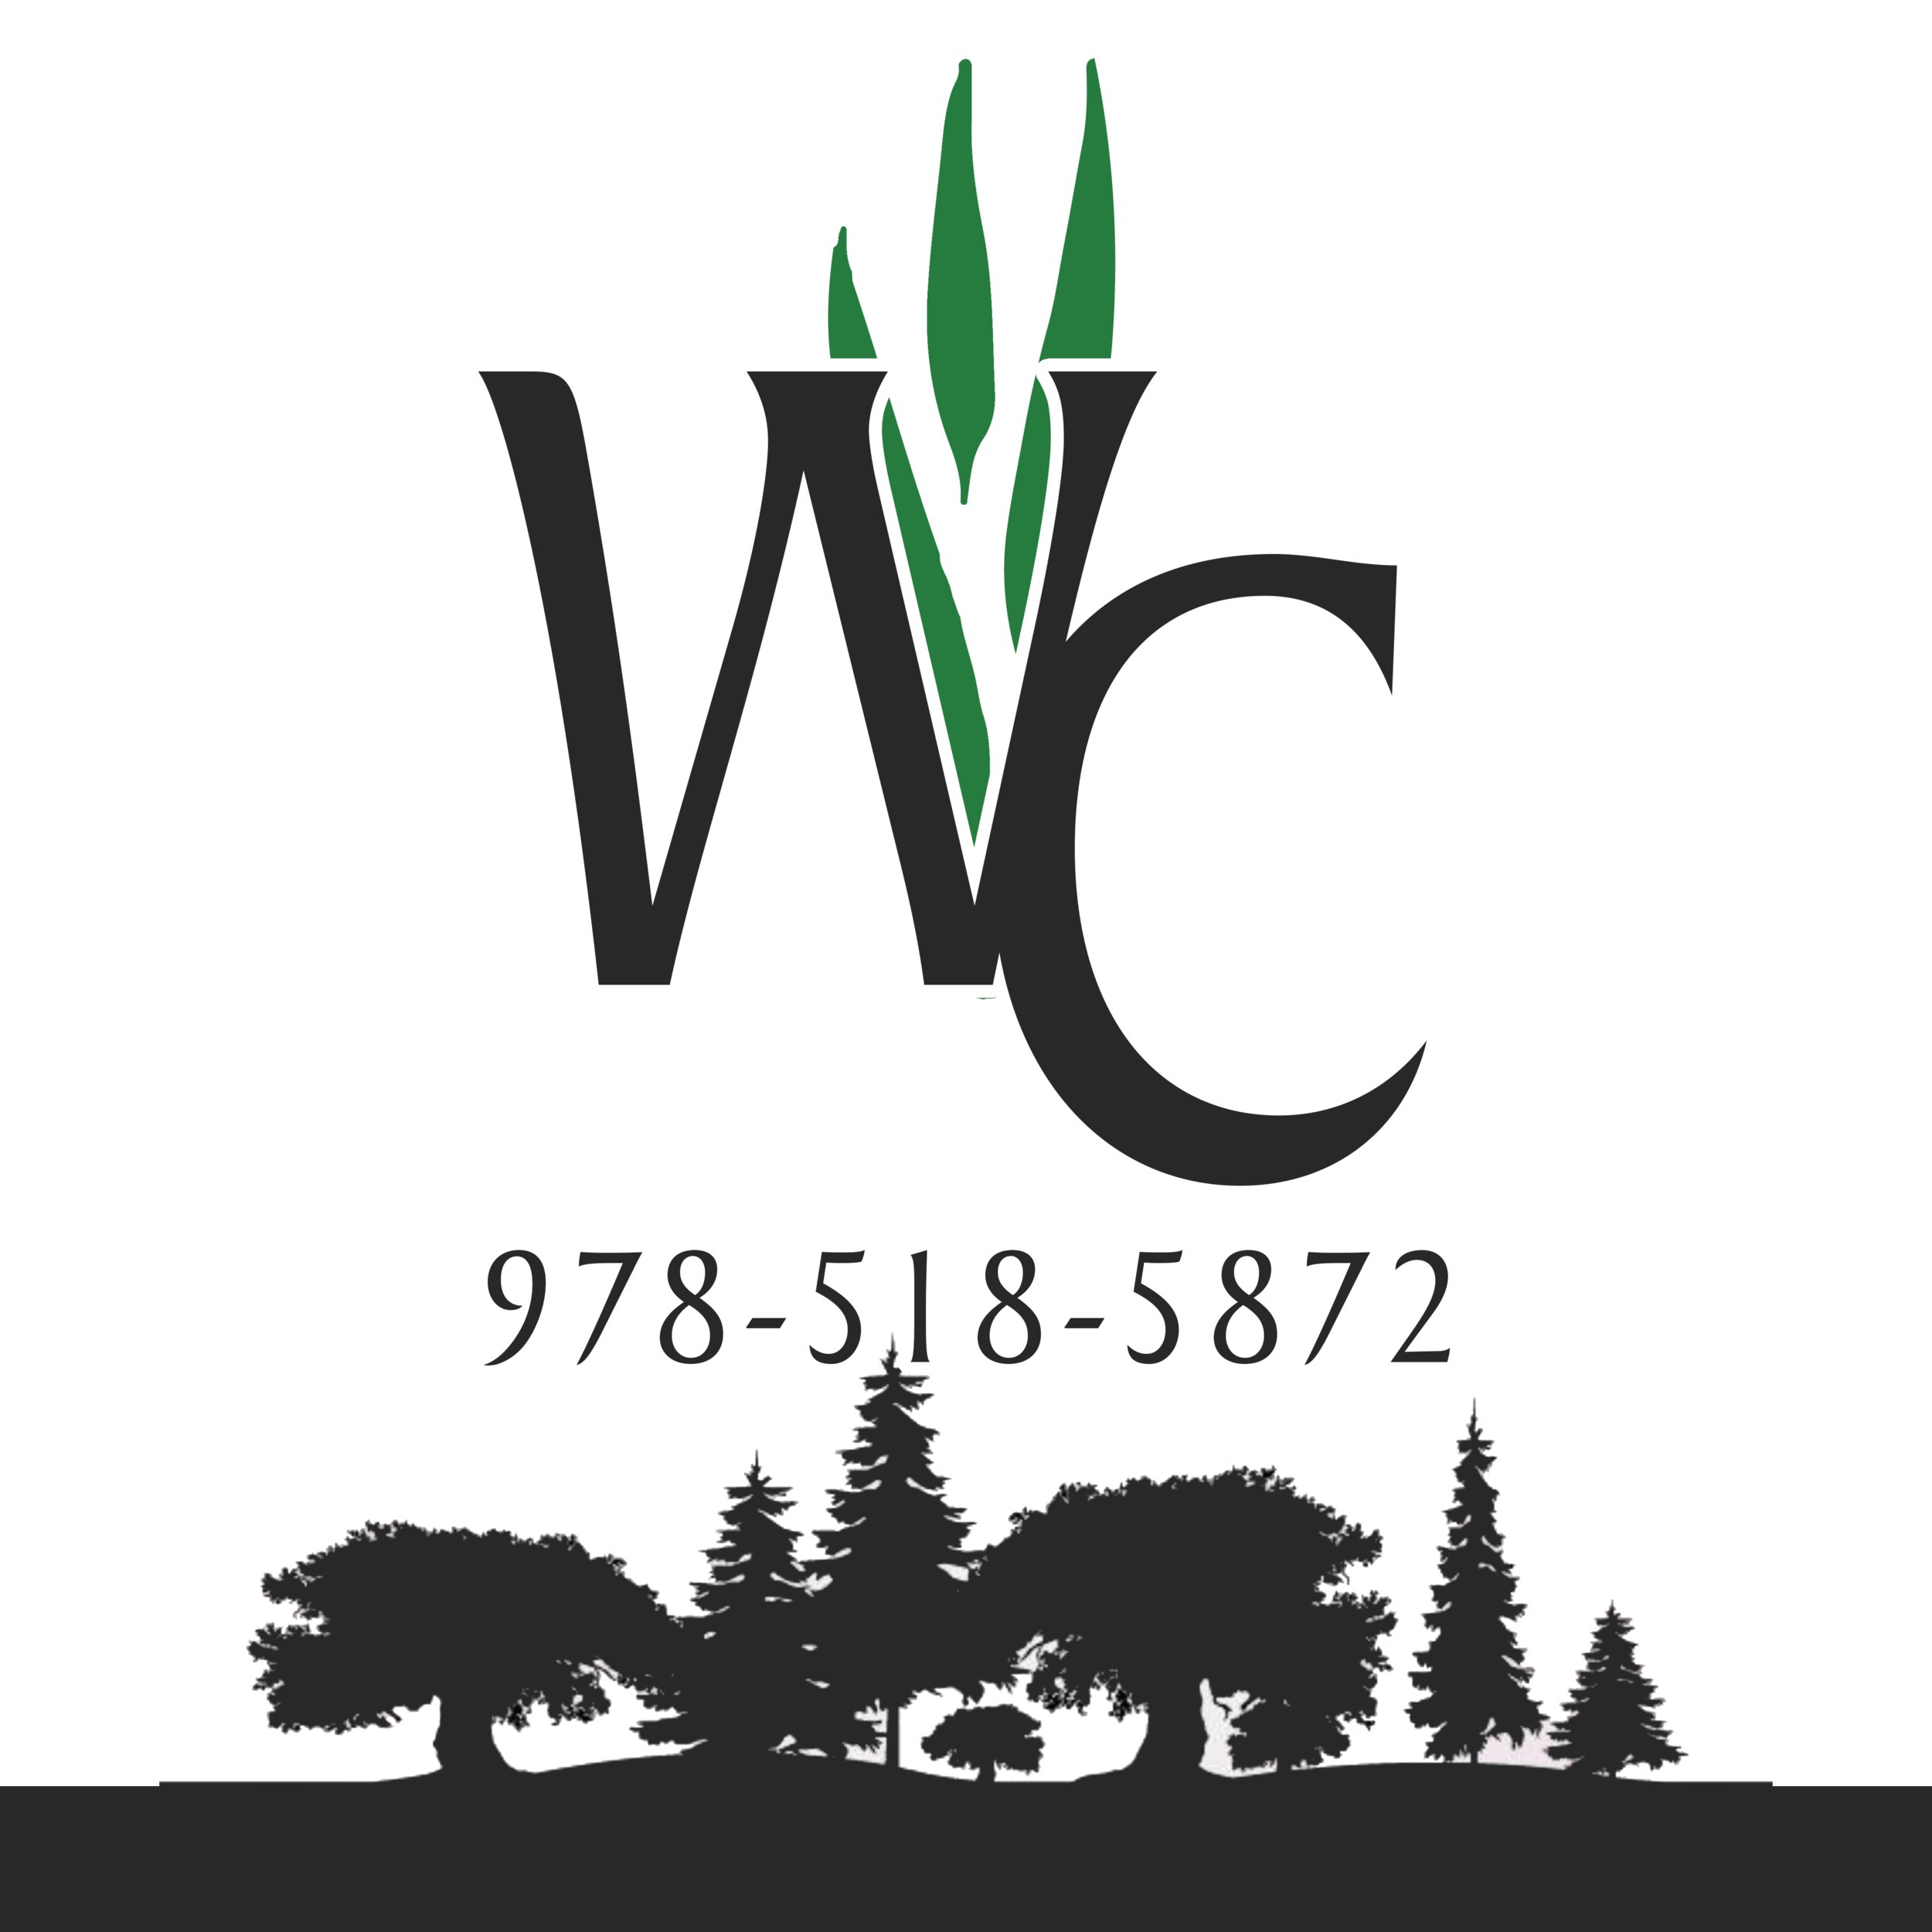 wc logo 1.png